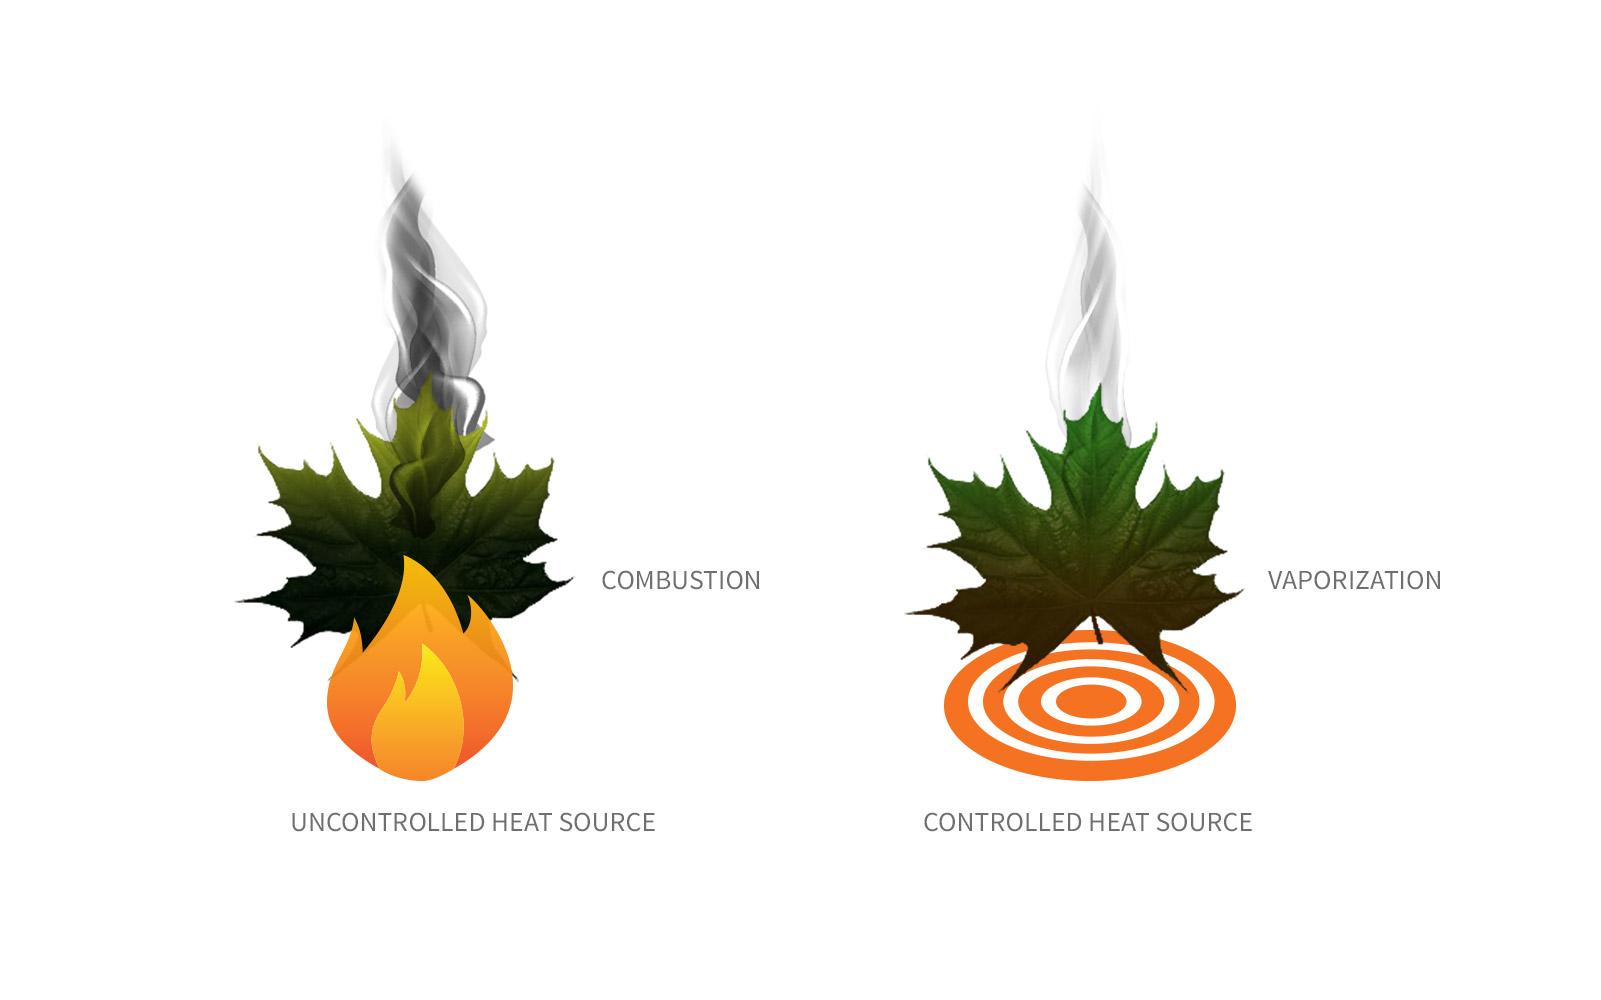 combustion vs vaporiztion